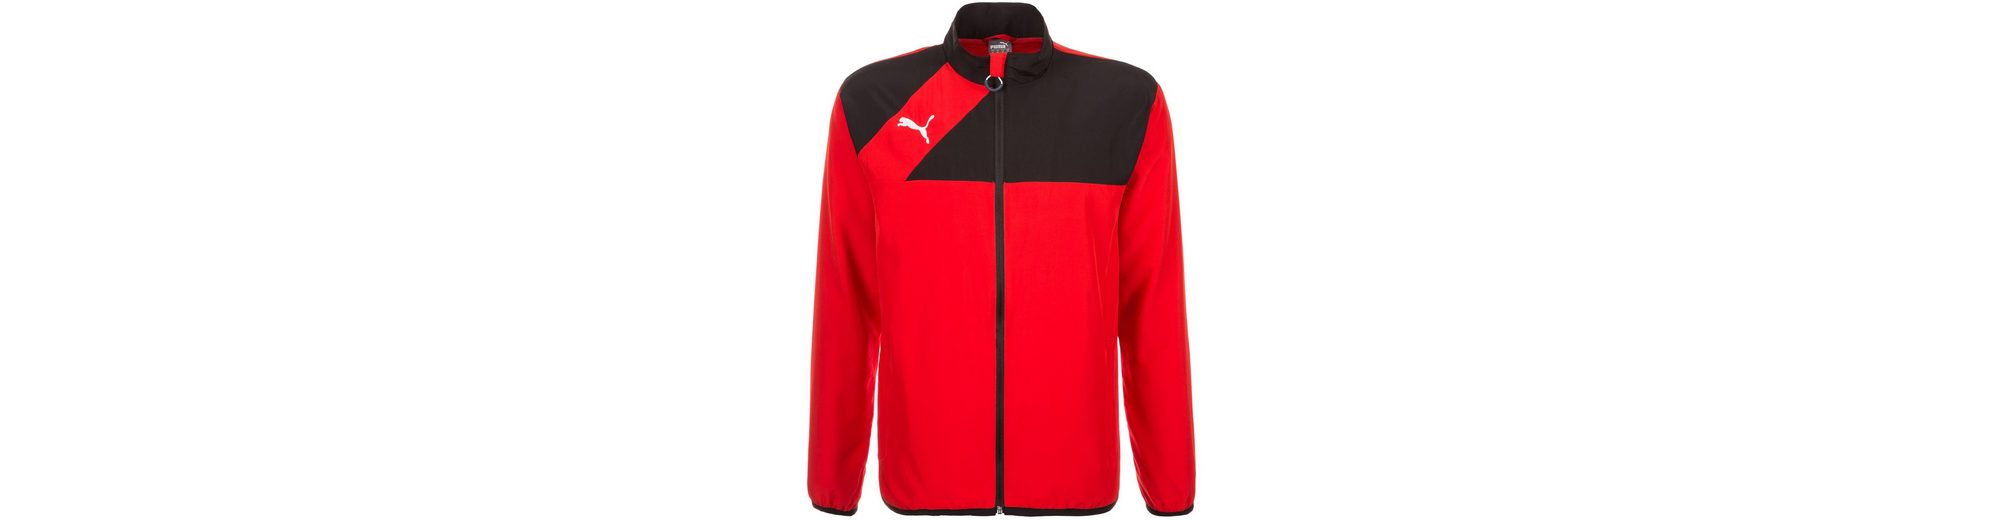 PUMA Esquadra Woven Trainingsjacke Herren Günstige Online Qualität Original 2018 Online-Verkauf MtNTD